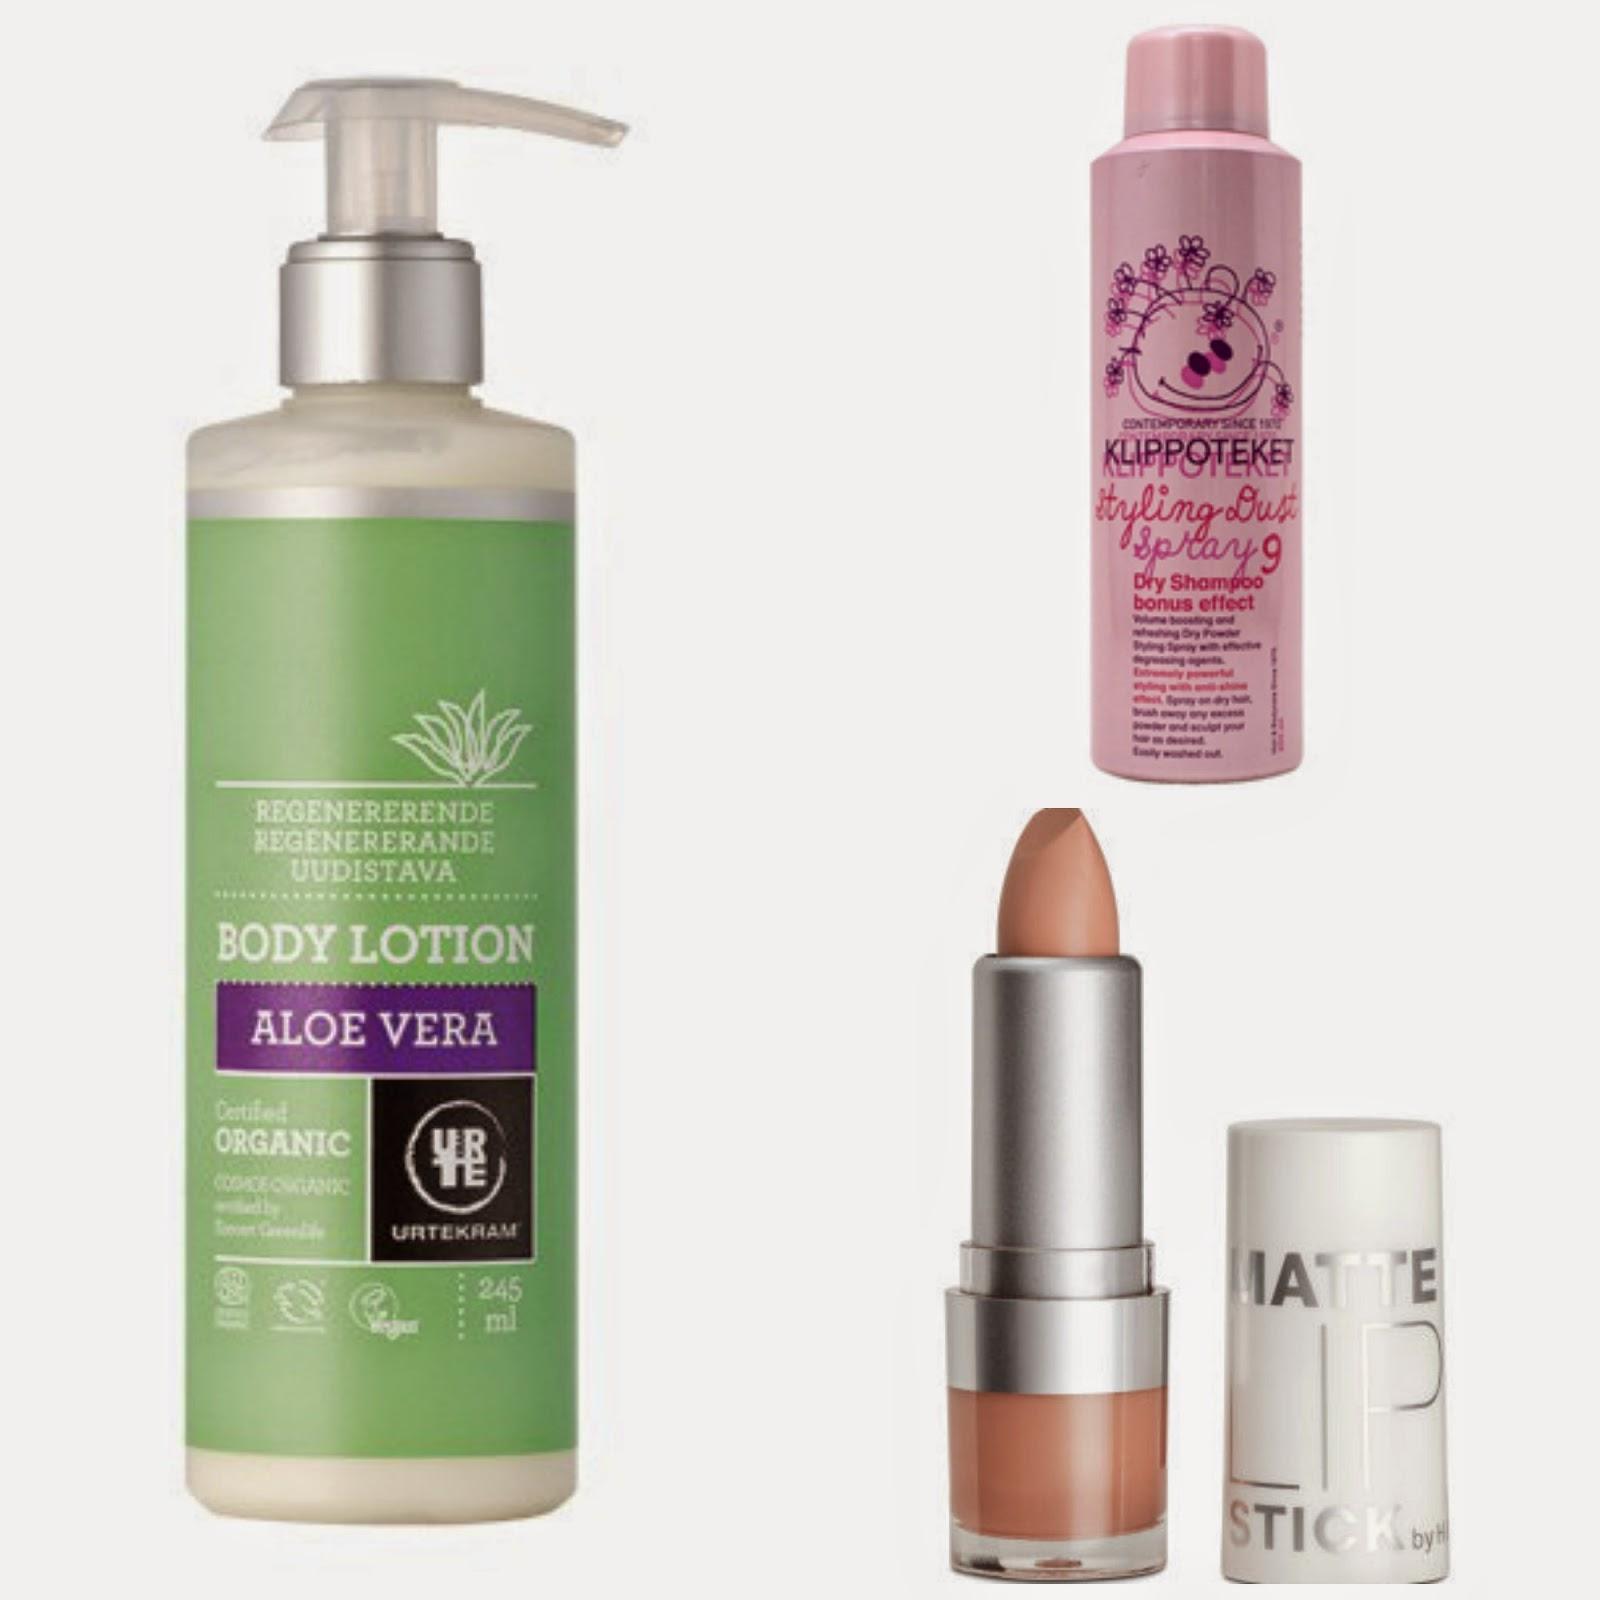 Urtekram, Klippoteket, H&M, Billig kosmetik, Bra produkter